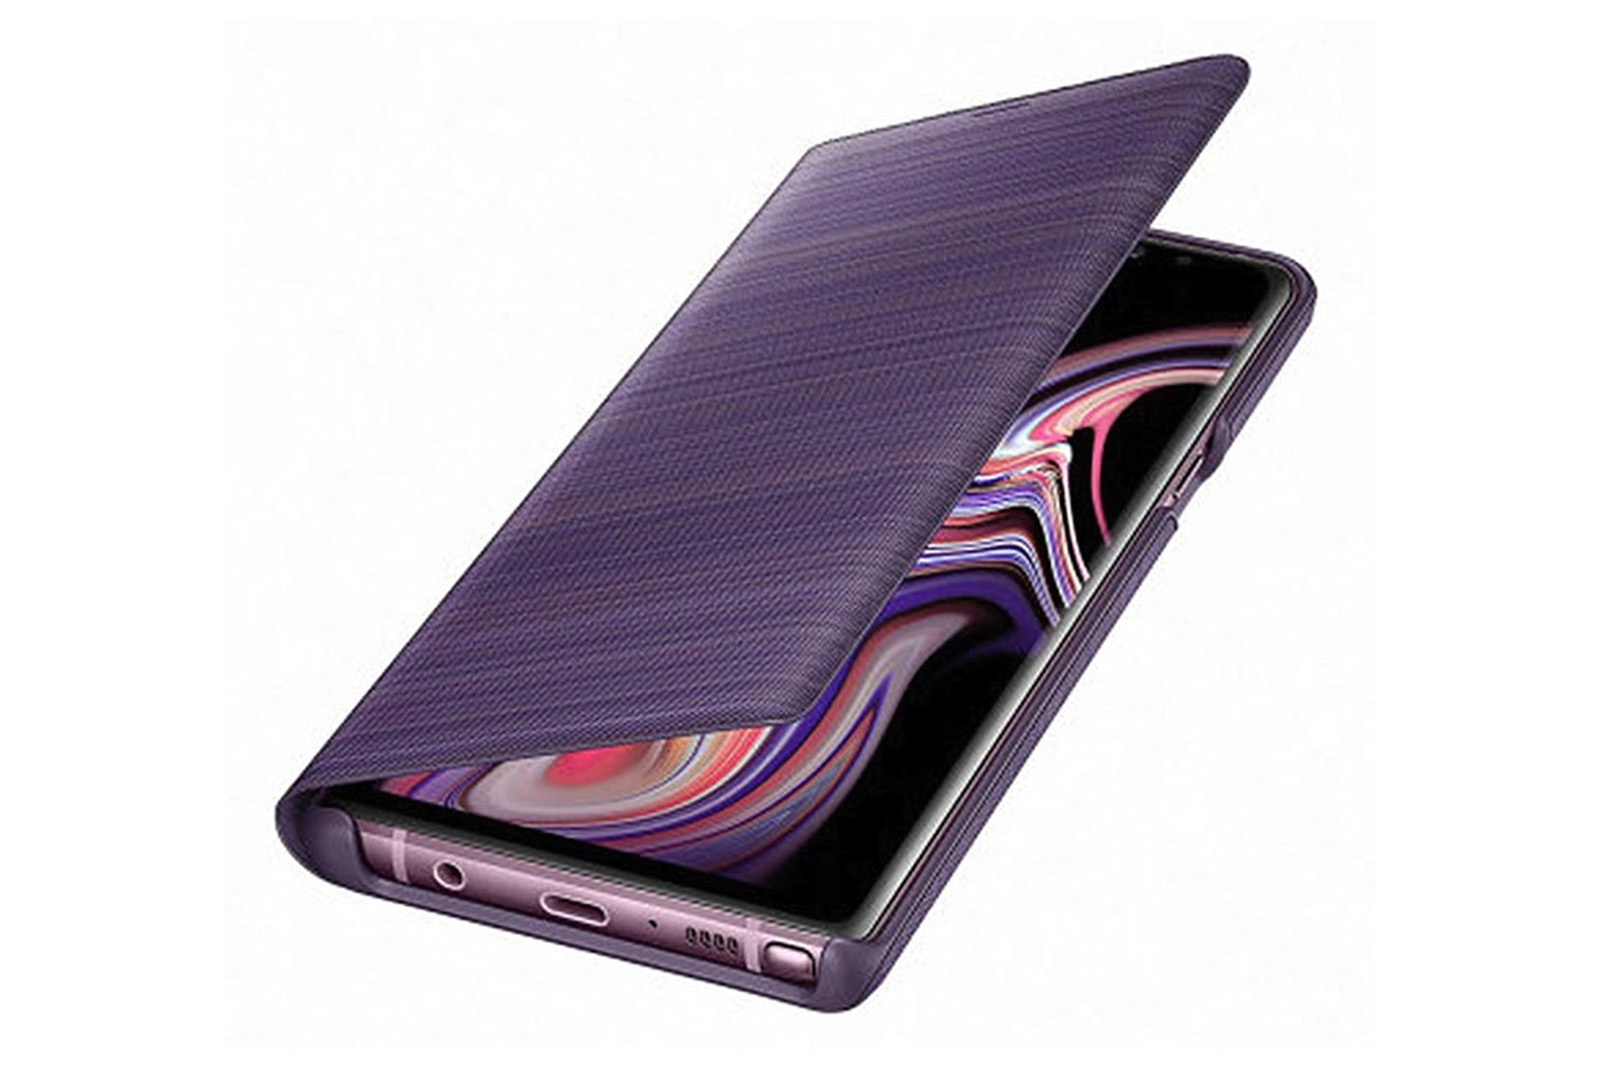 online retailer 4c294 95c7a Details about Official Samsung Galaxy Note 9 Lavender LED Flip Wallet /  Case - EF-NN960PVEGWW